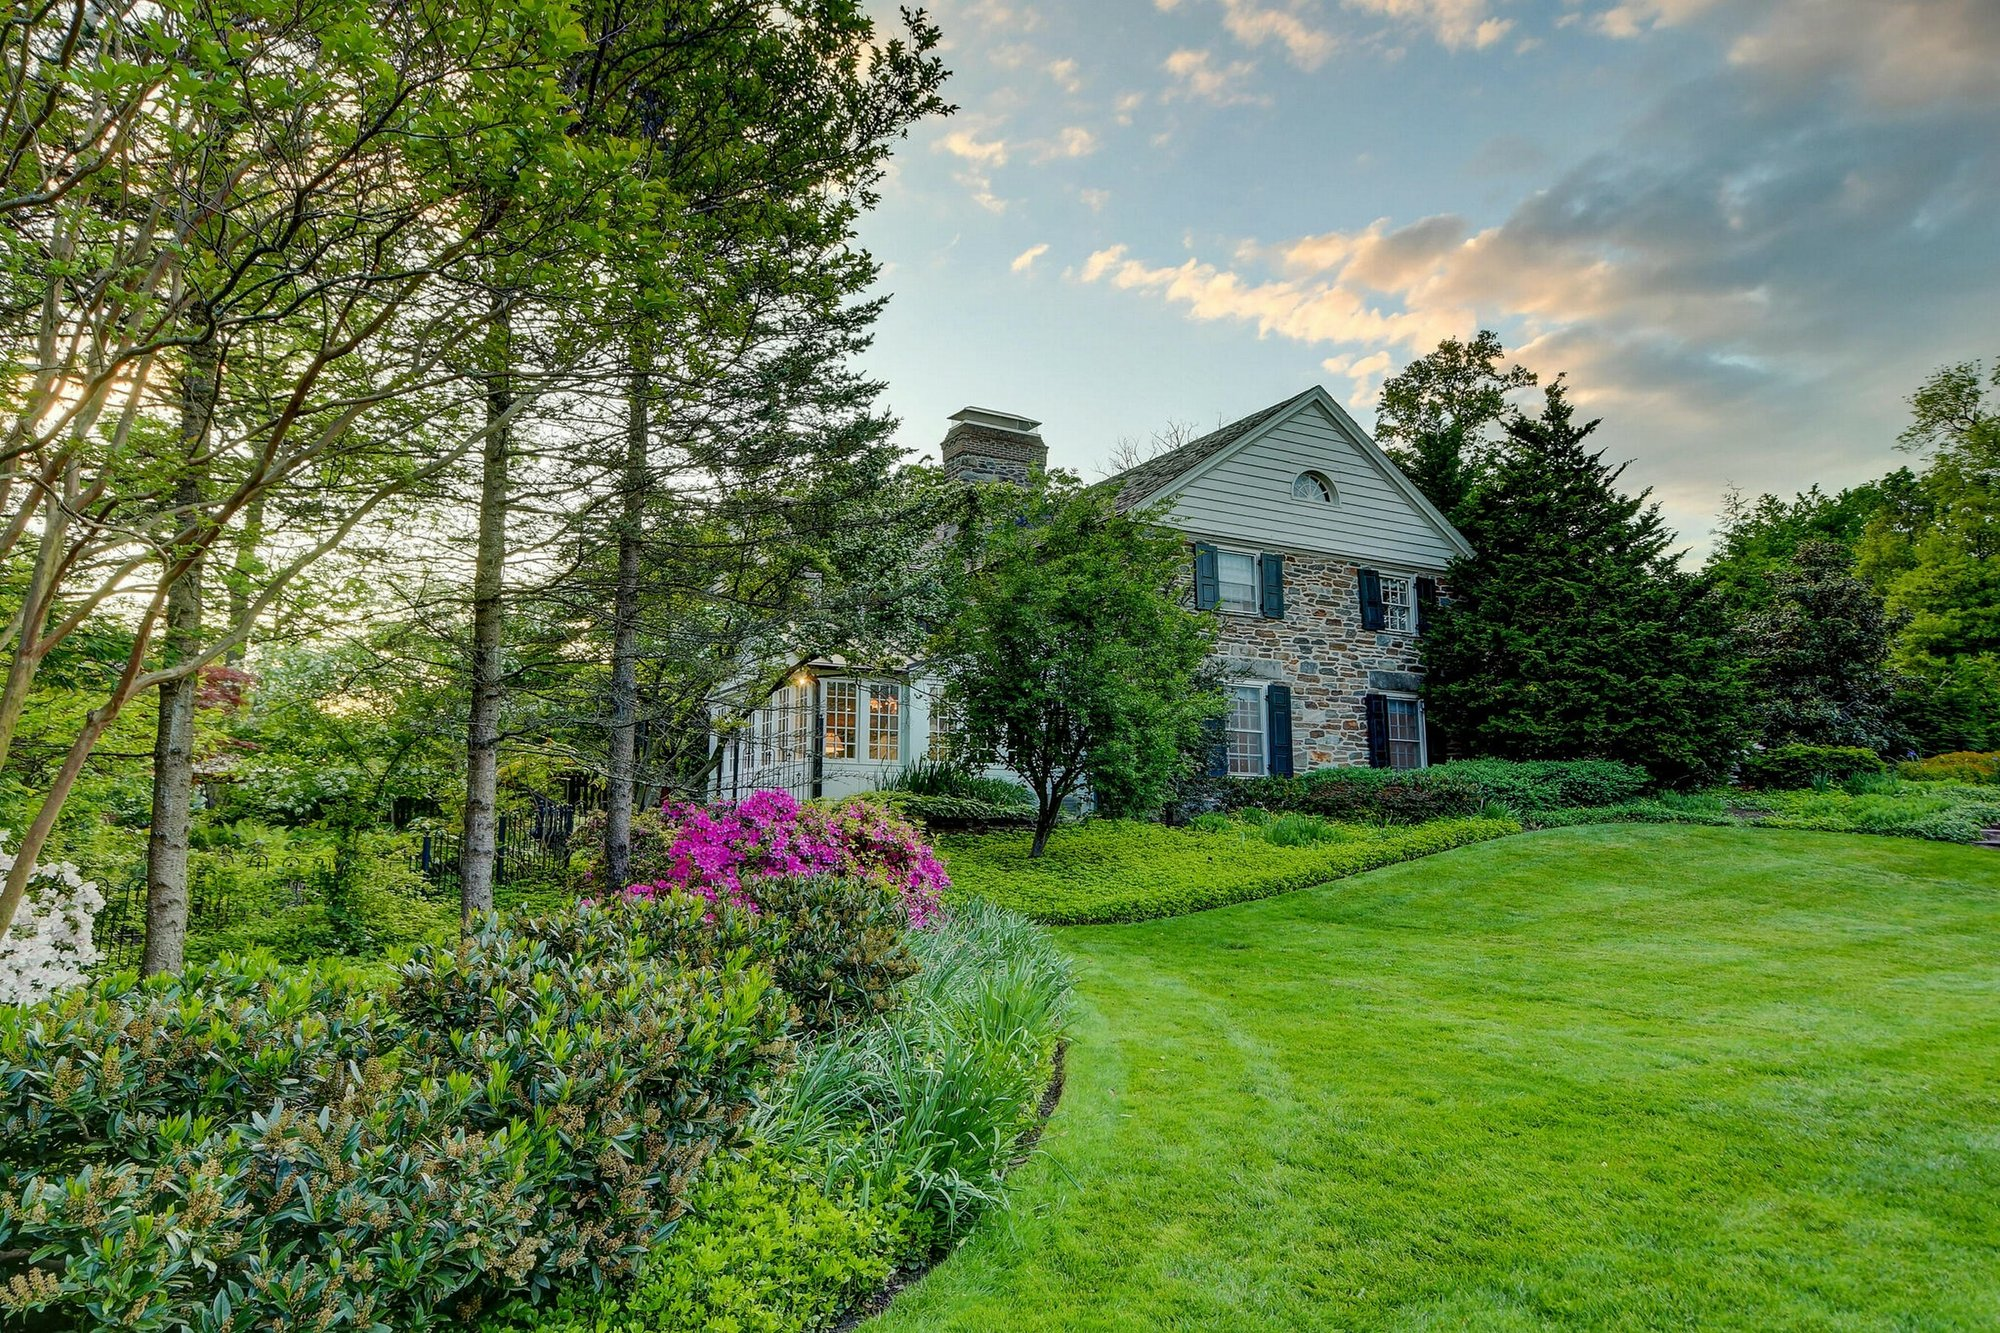 Casa a Towson, Maryland, Stati Uniti 1 - 11456387